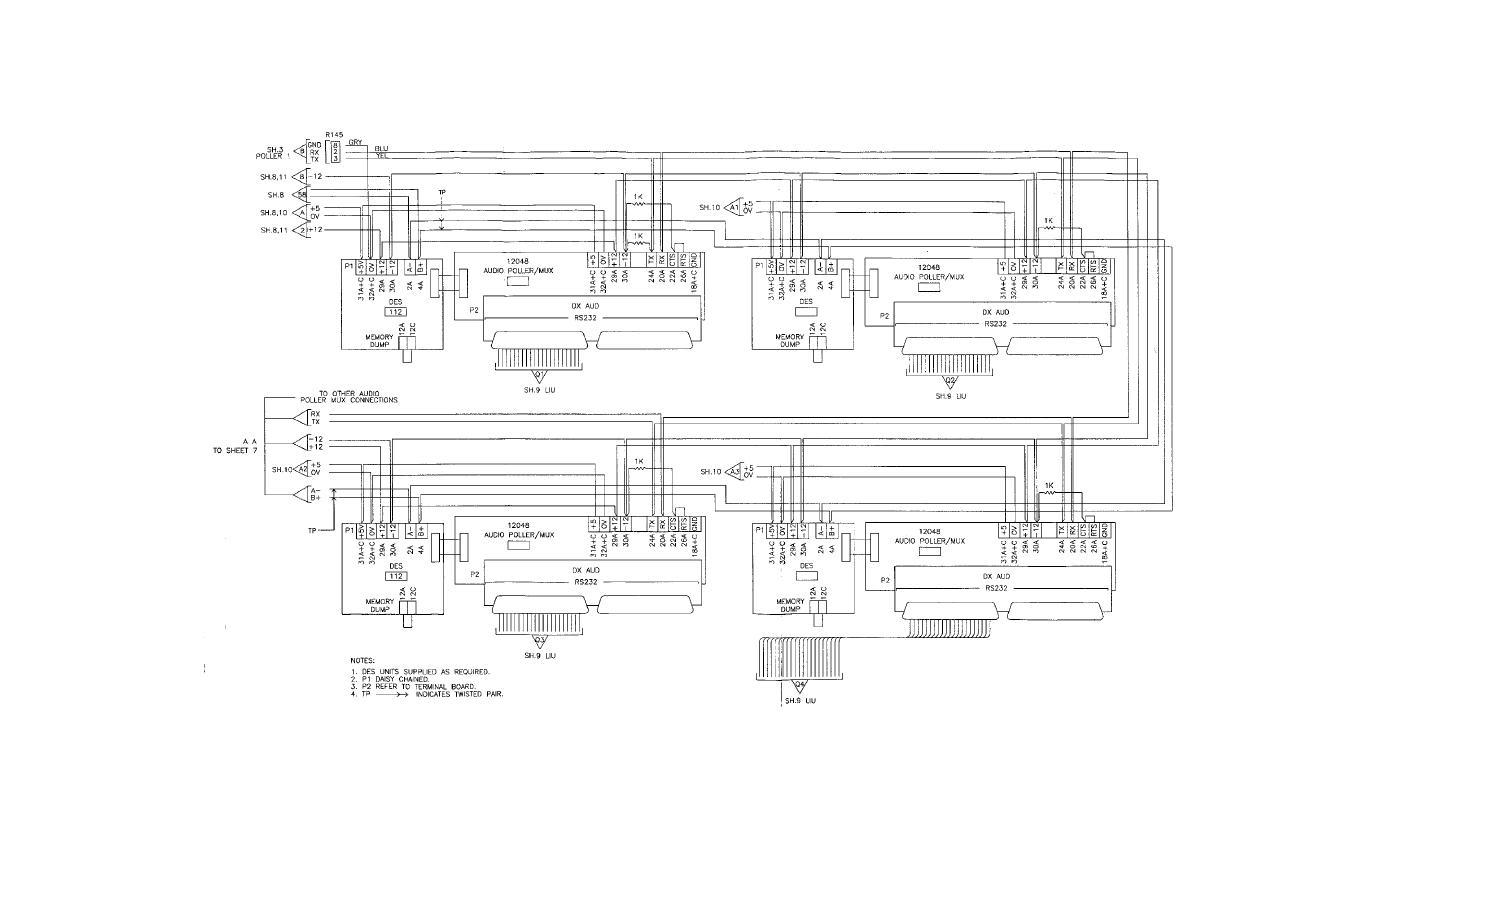 Fo 2 Pmc Functional Wiring Block Diagram Sheet 5 Of 11